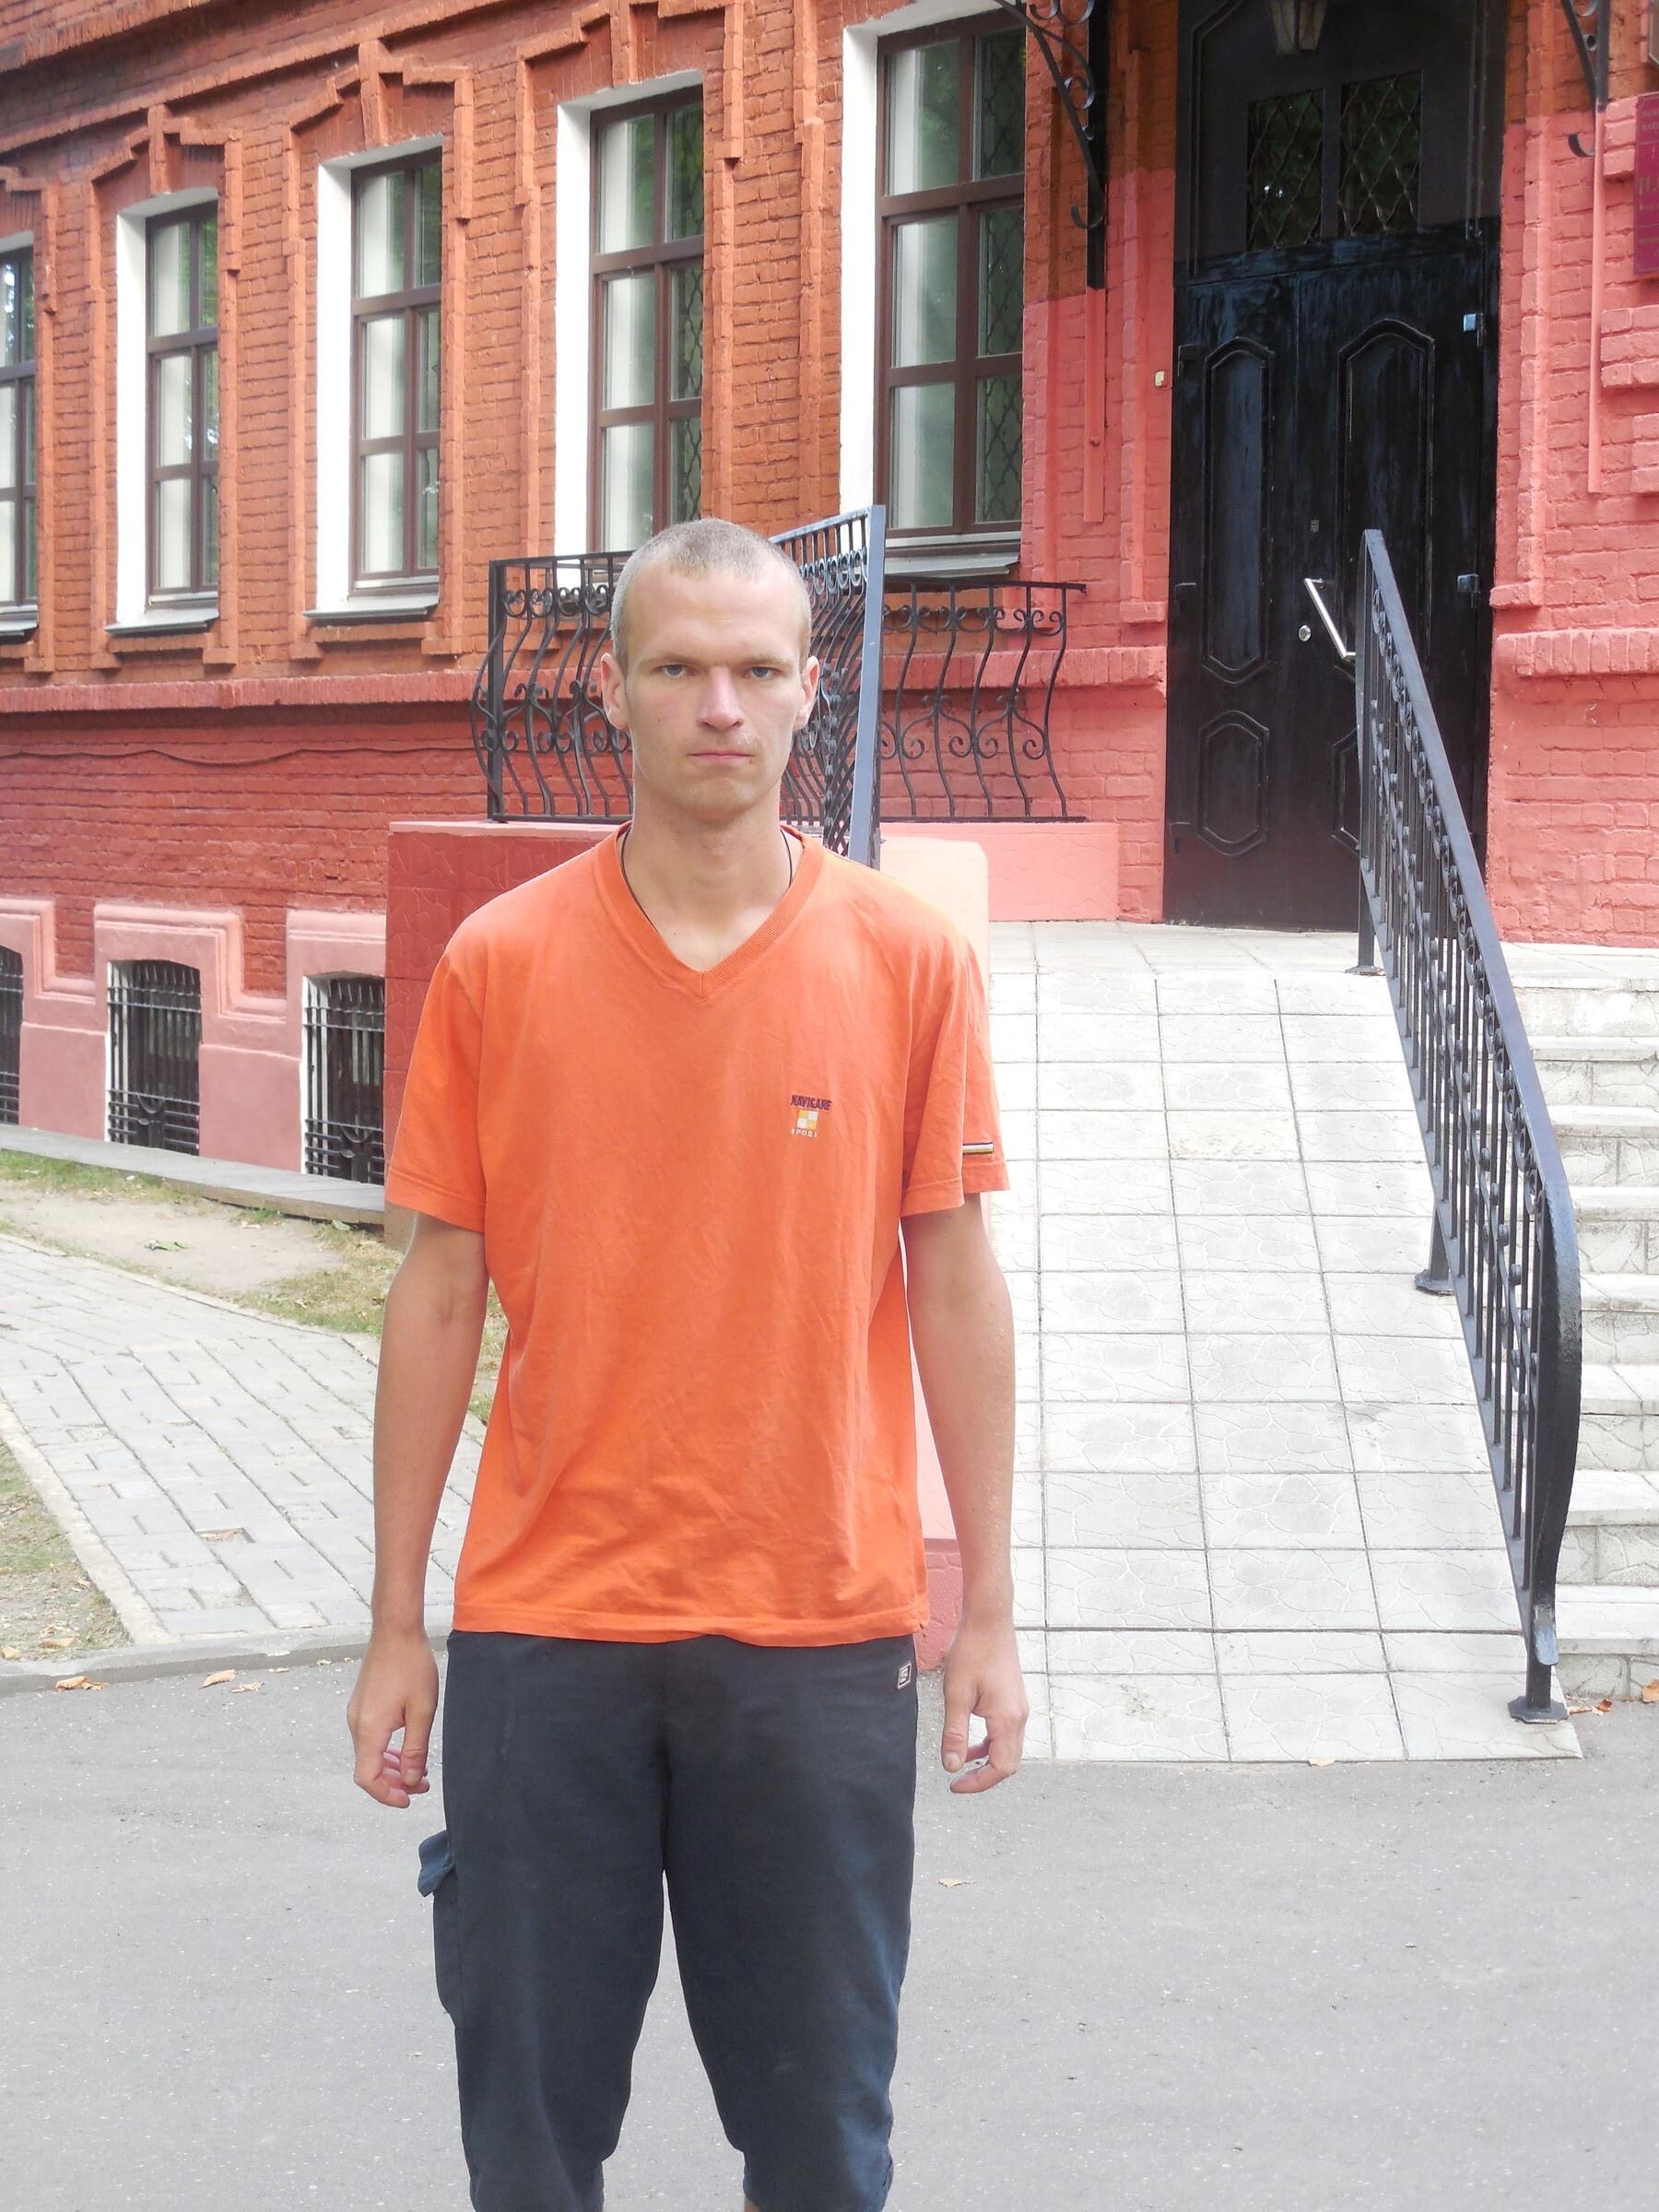 Арт-центр Марка Шагала, Витебск - Арт-центр Марка Шагала